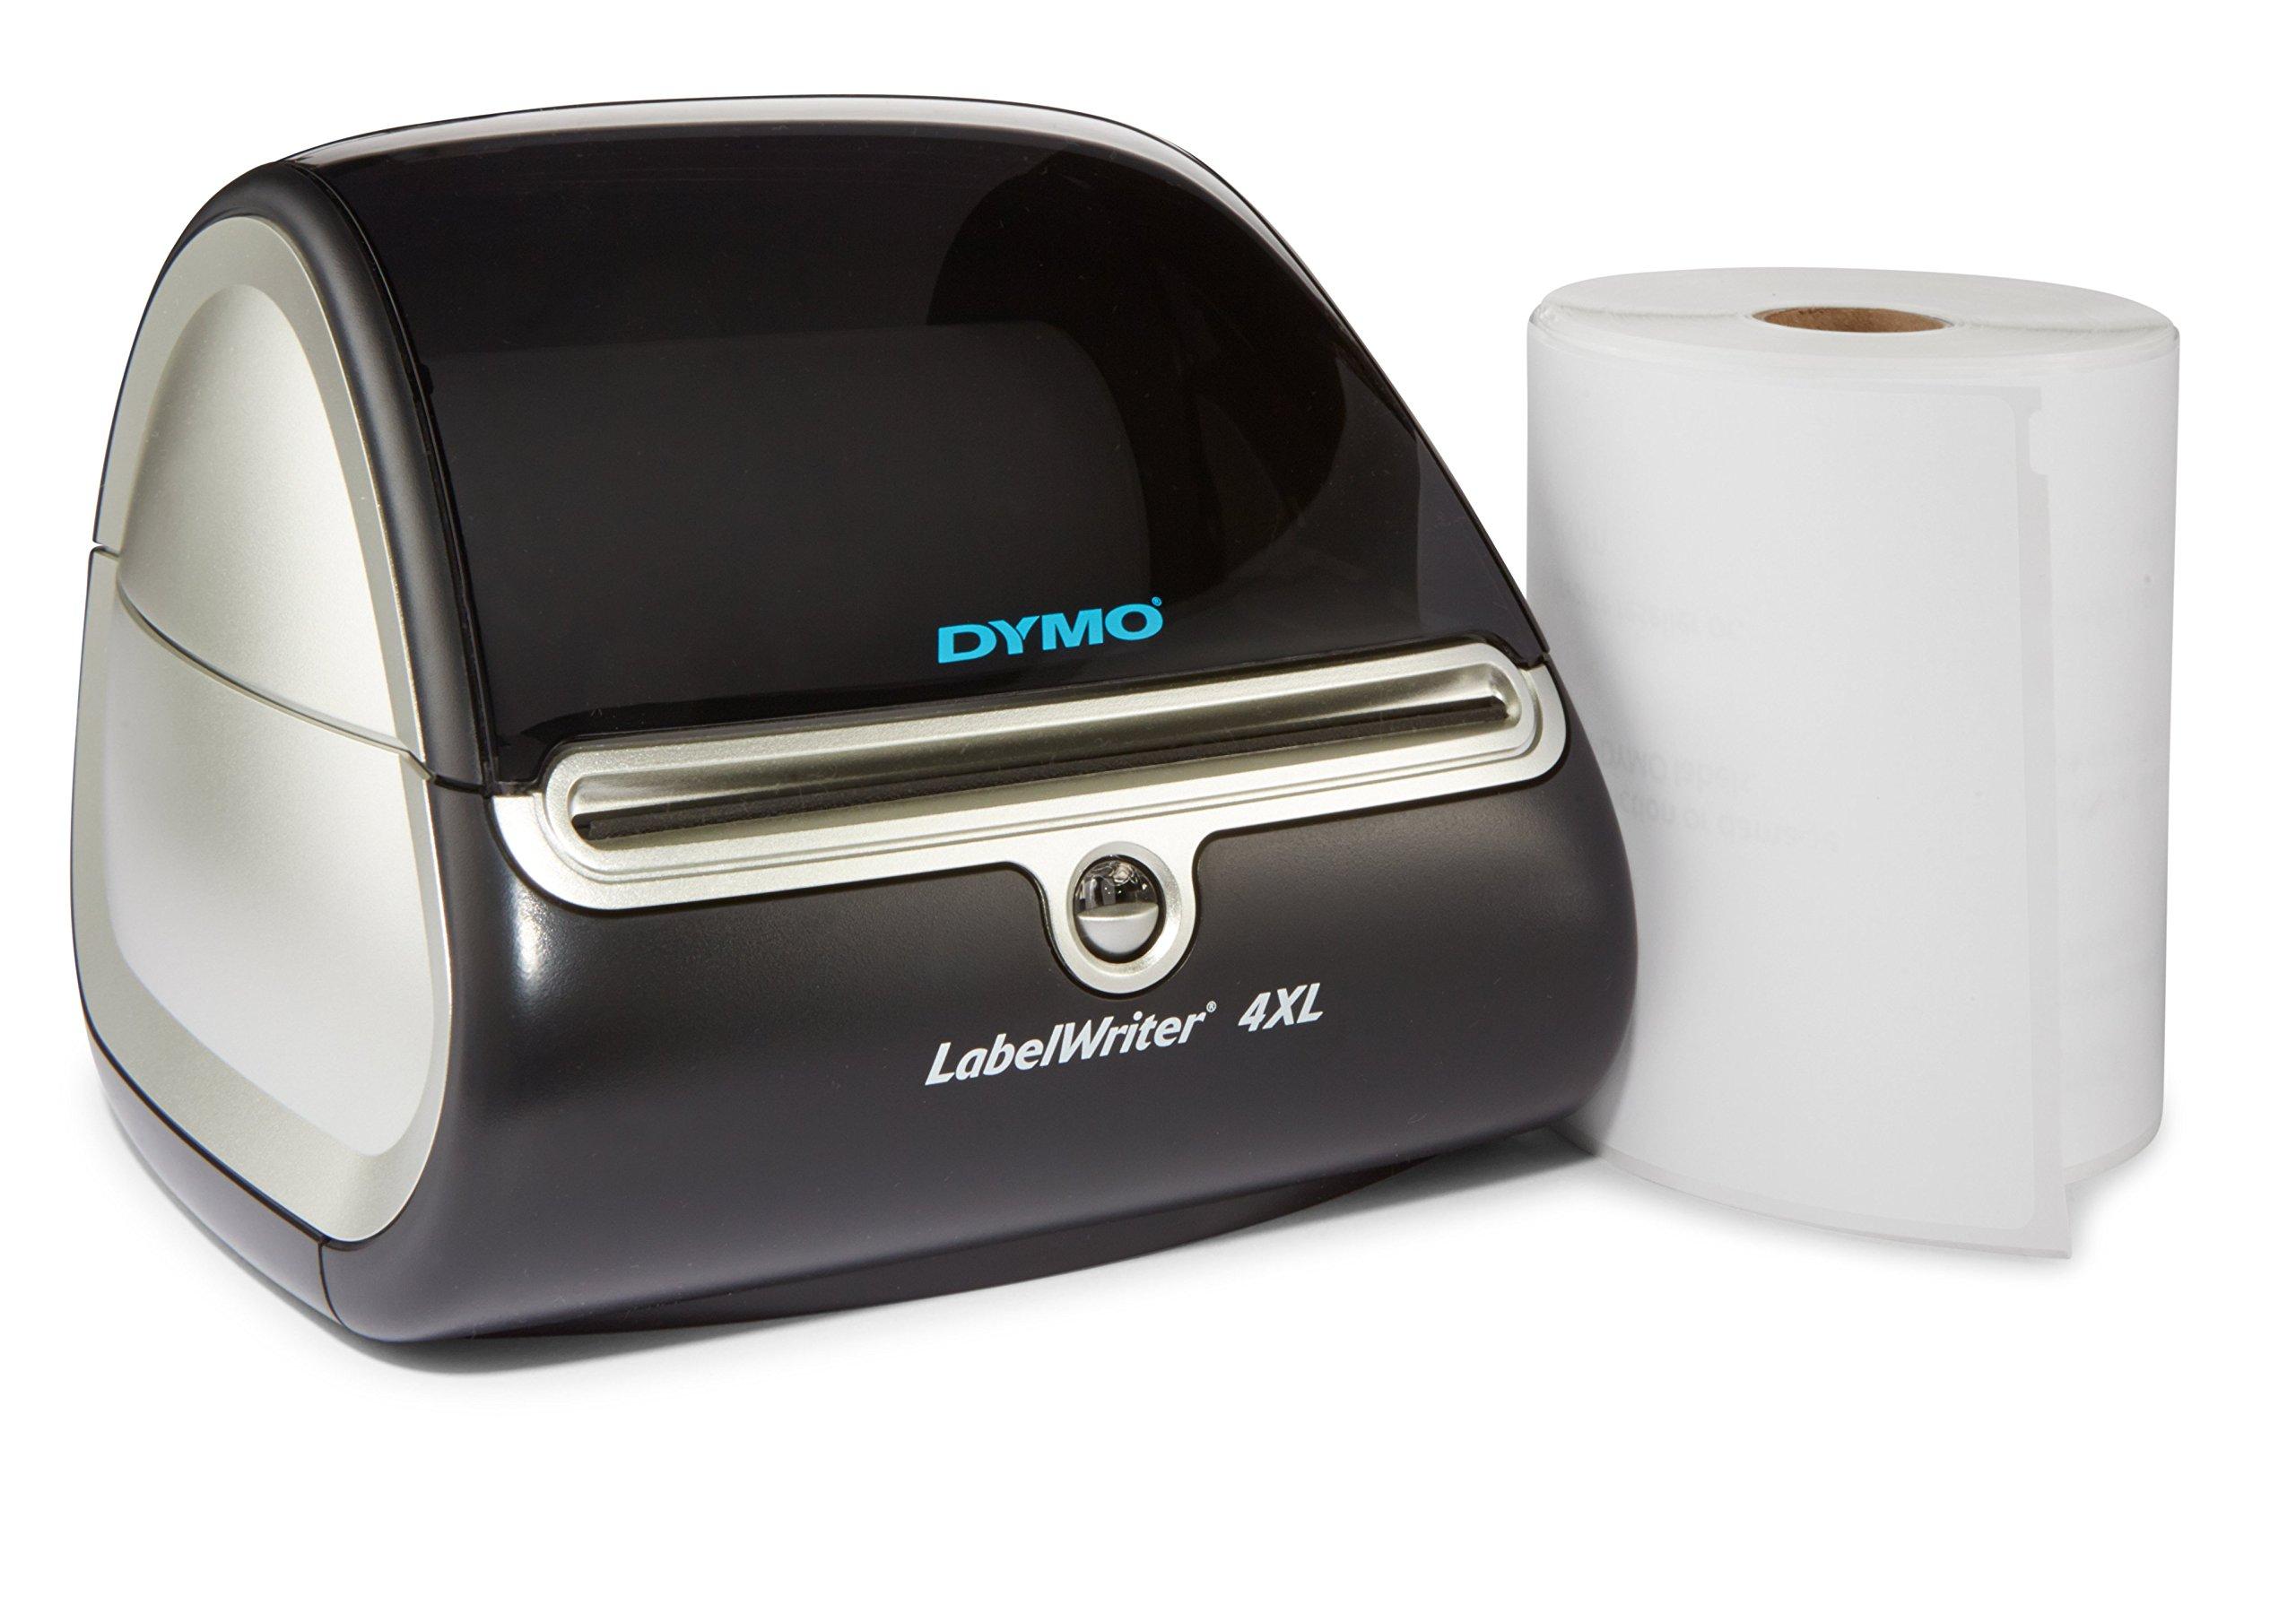 DYMO LabelWriter 4XL Thermal Label Printer (1755120) plus 1 bonus Shipping Roll 1755120 by DYMO